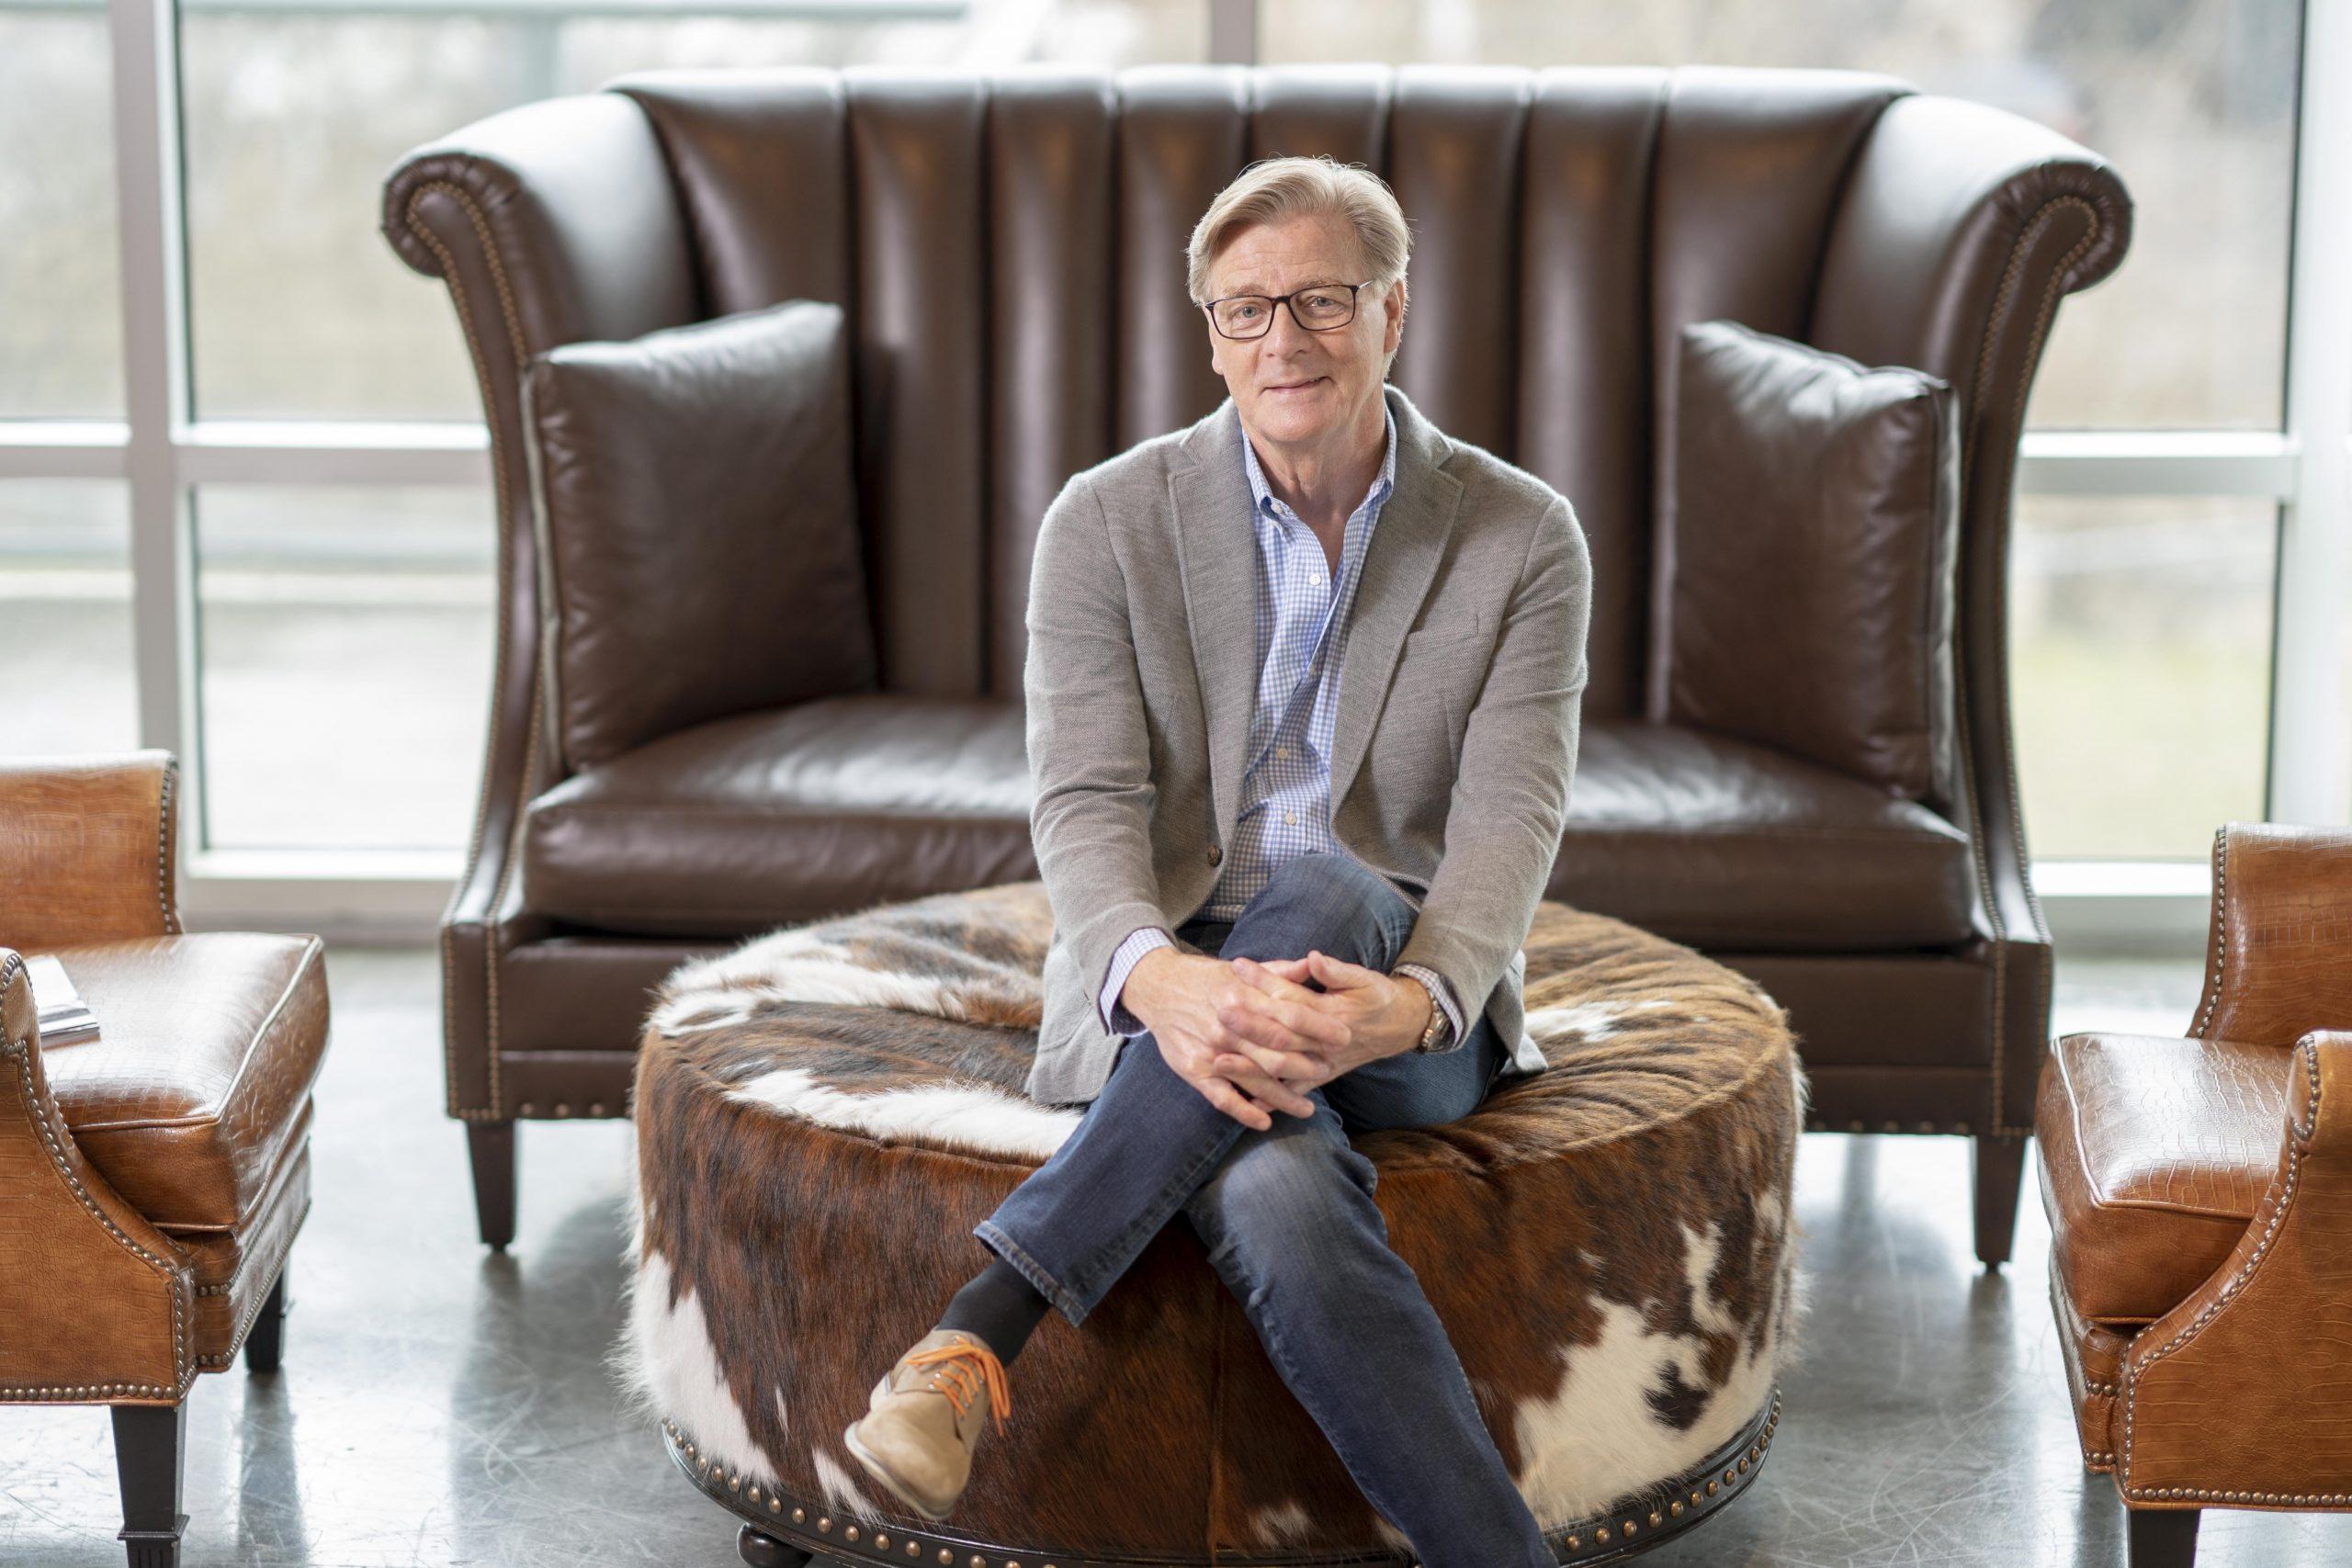 Michael Blanton's Sharing Hope Interview Headshot Photograph